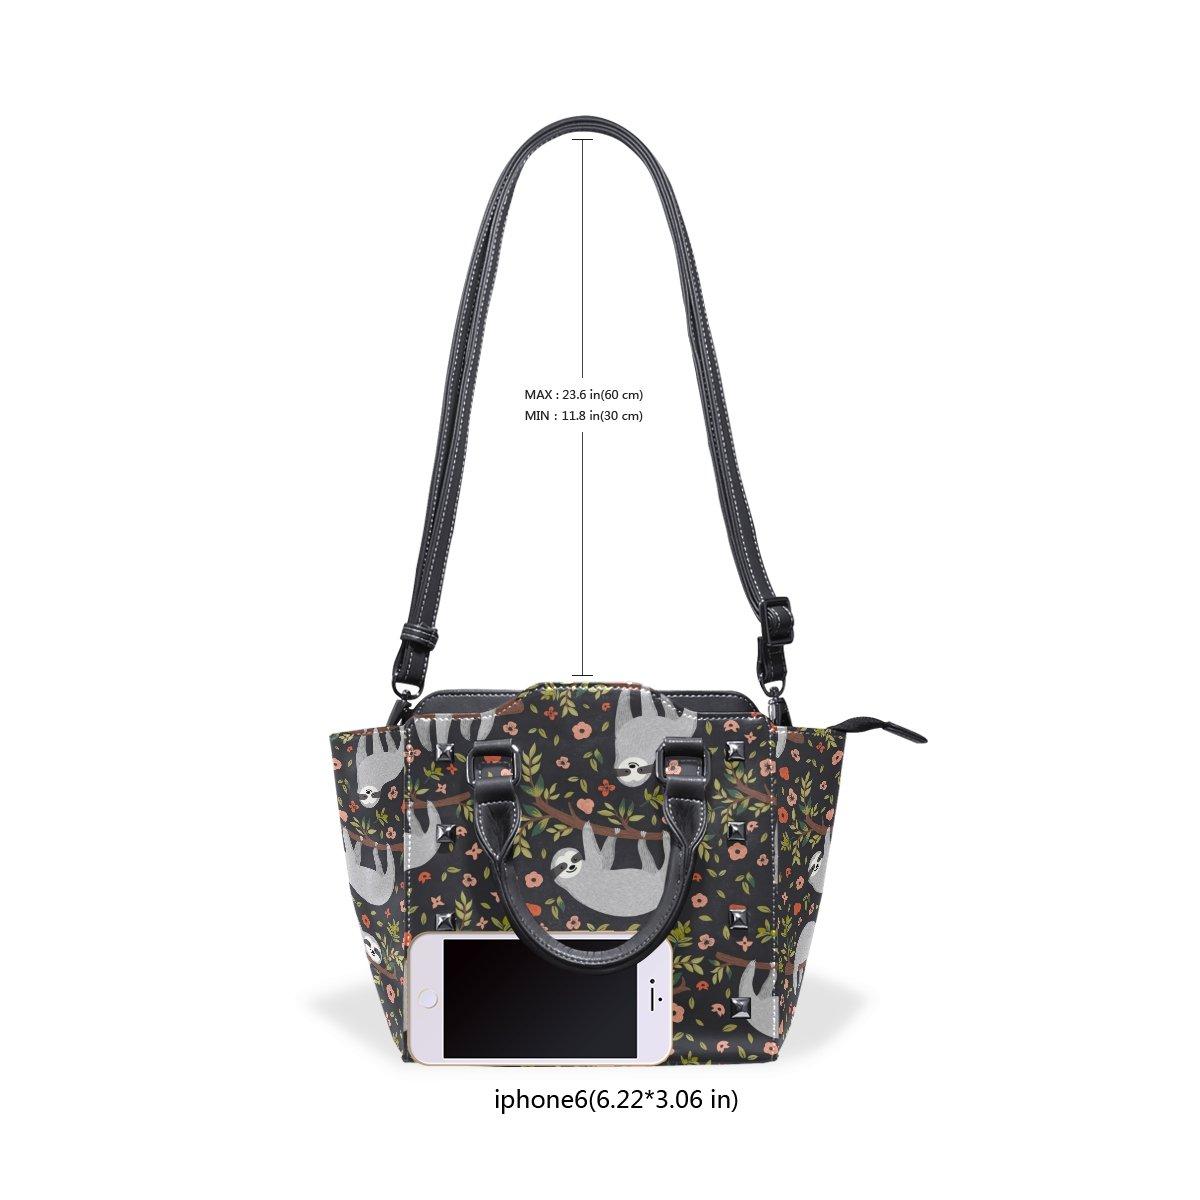 Womens Top Handle Satchel Handbag Forest Cute Sloth Branch Flowers Ladies PU Leather Shoulder Bag Crossbody Bag